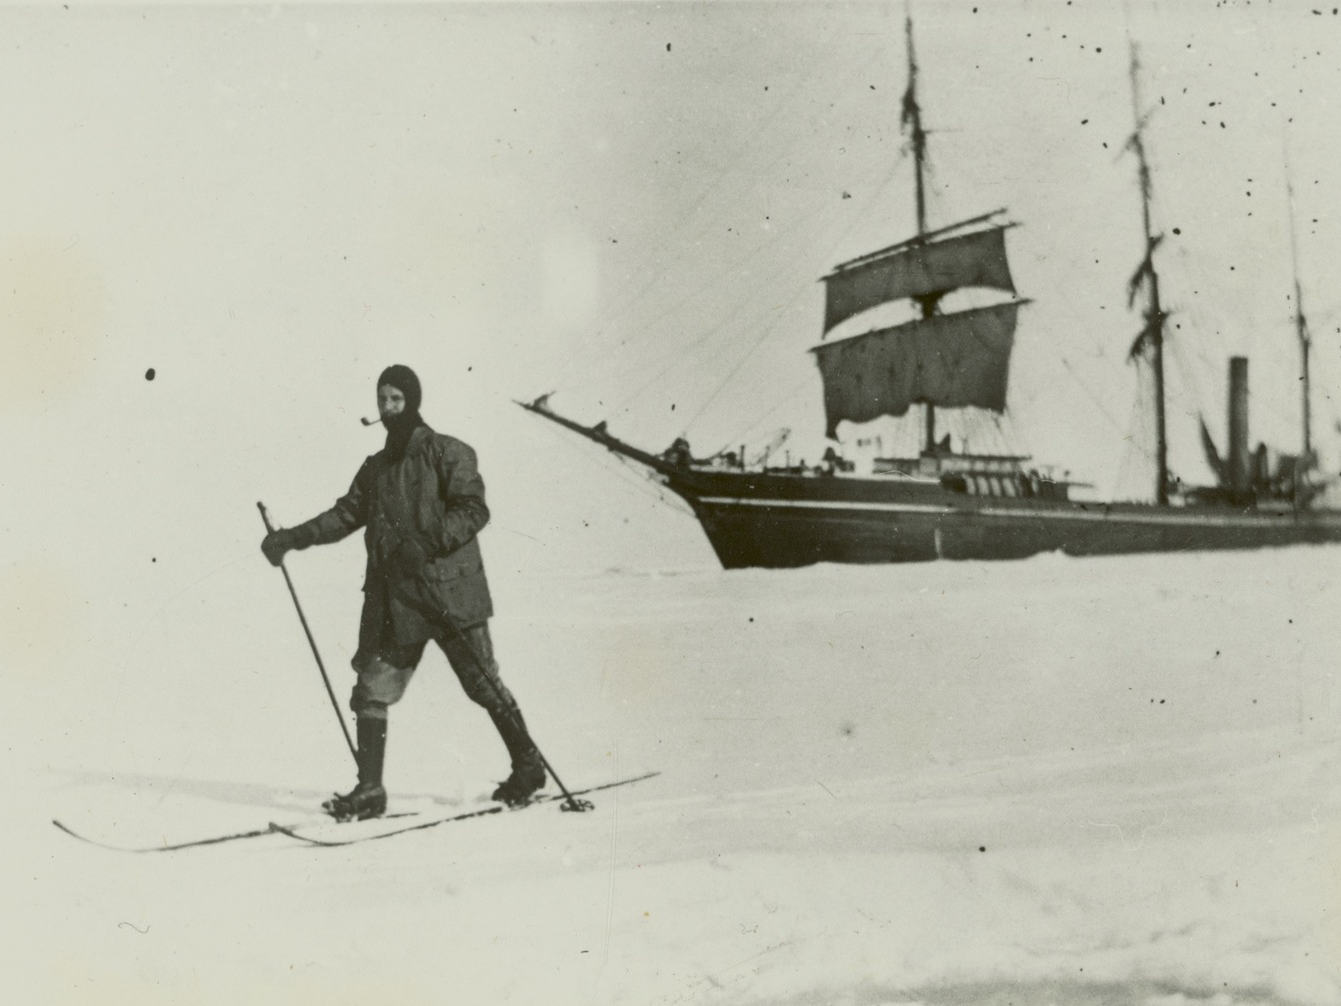 W.A. Horton, Engineer on the Terra Nova, skiing in McMurdo Sound.  c. Lyttelton Museum collection